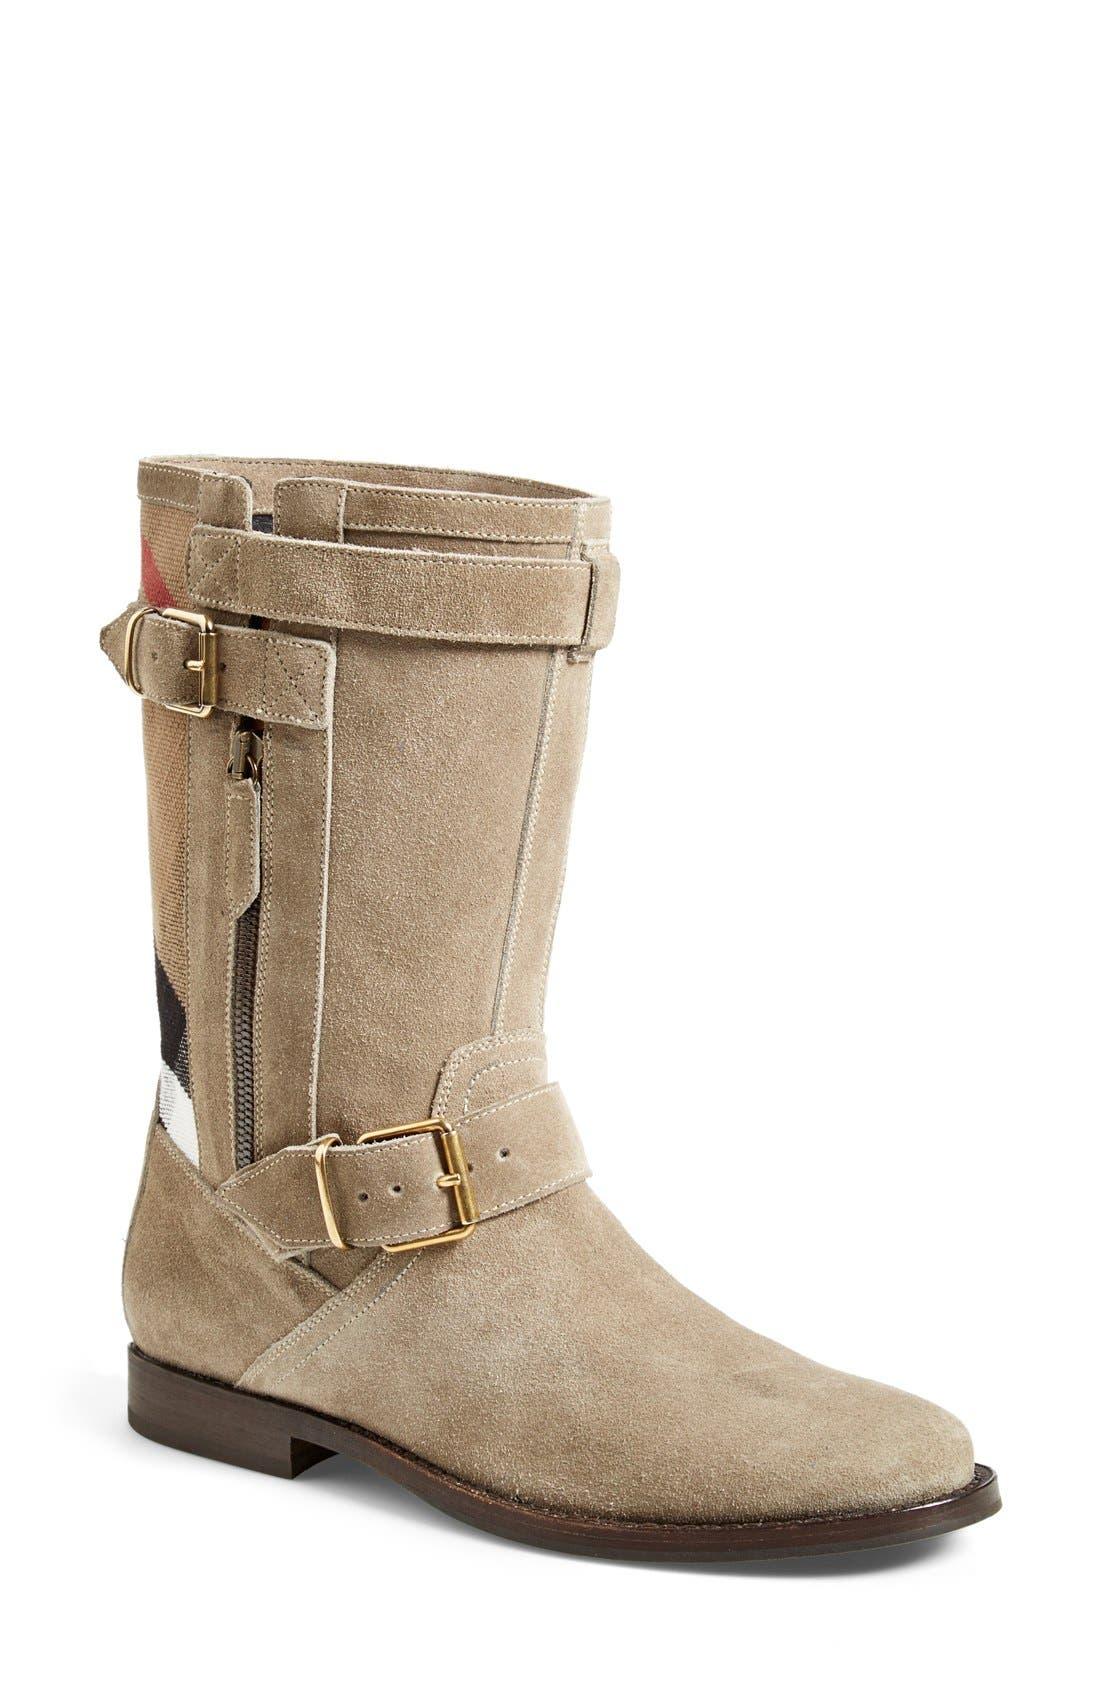 Alternate Image 1 Selected - Burberry 'Grantville' Boot